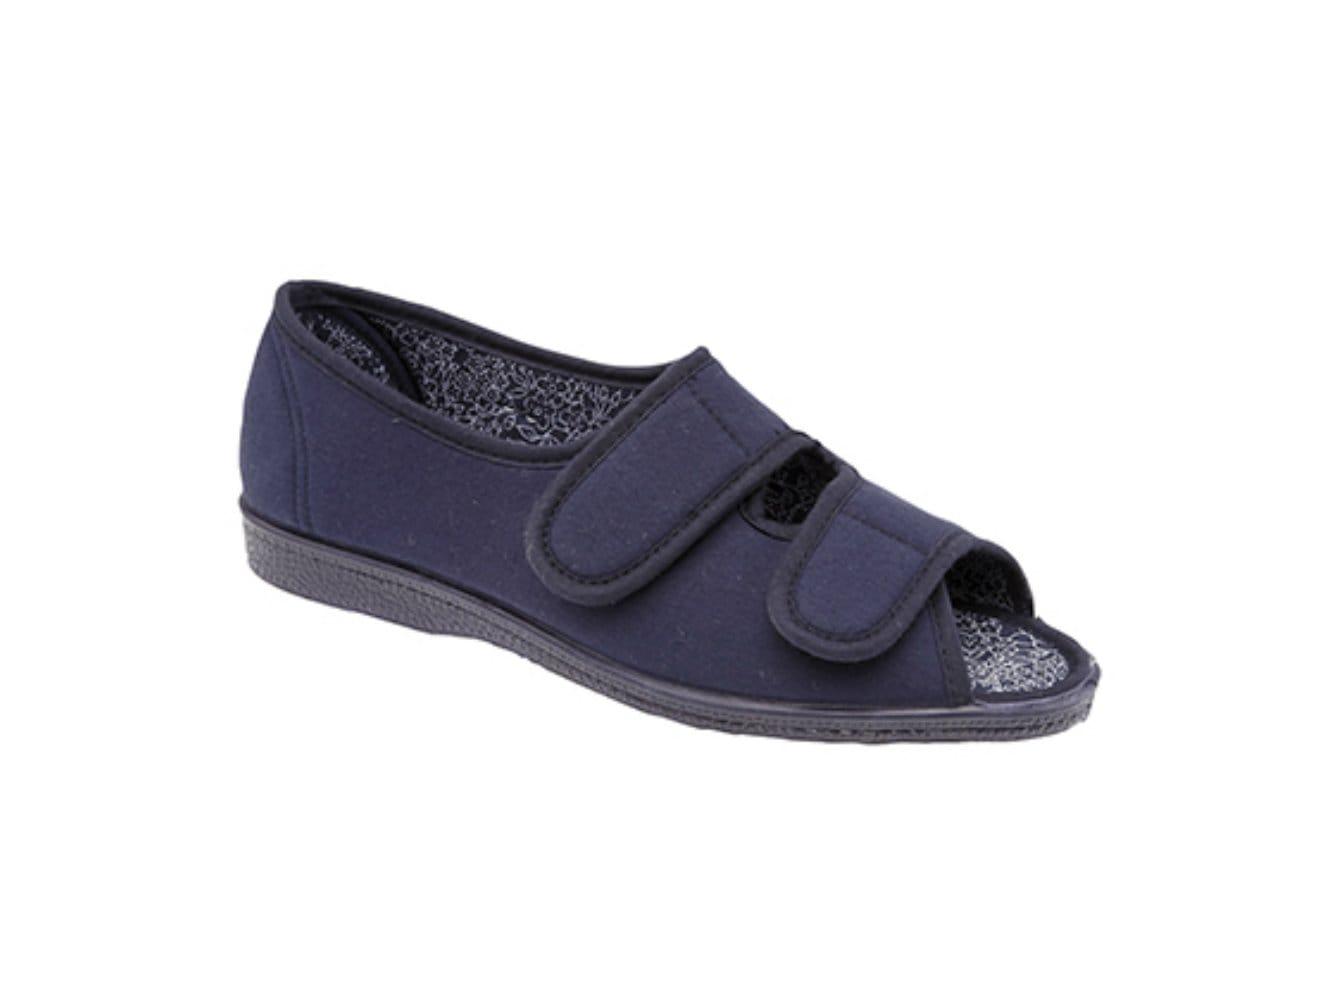 Cosies Womens Velcro Slippers Ladies Slippers Ladies Velcro Slippers Navy Size